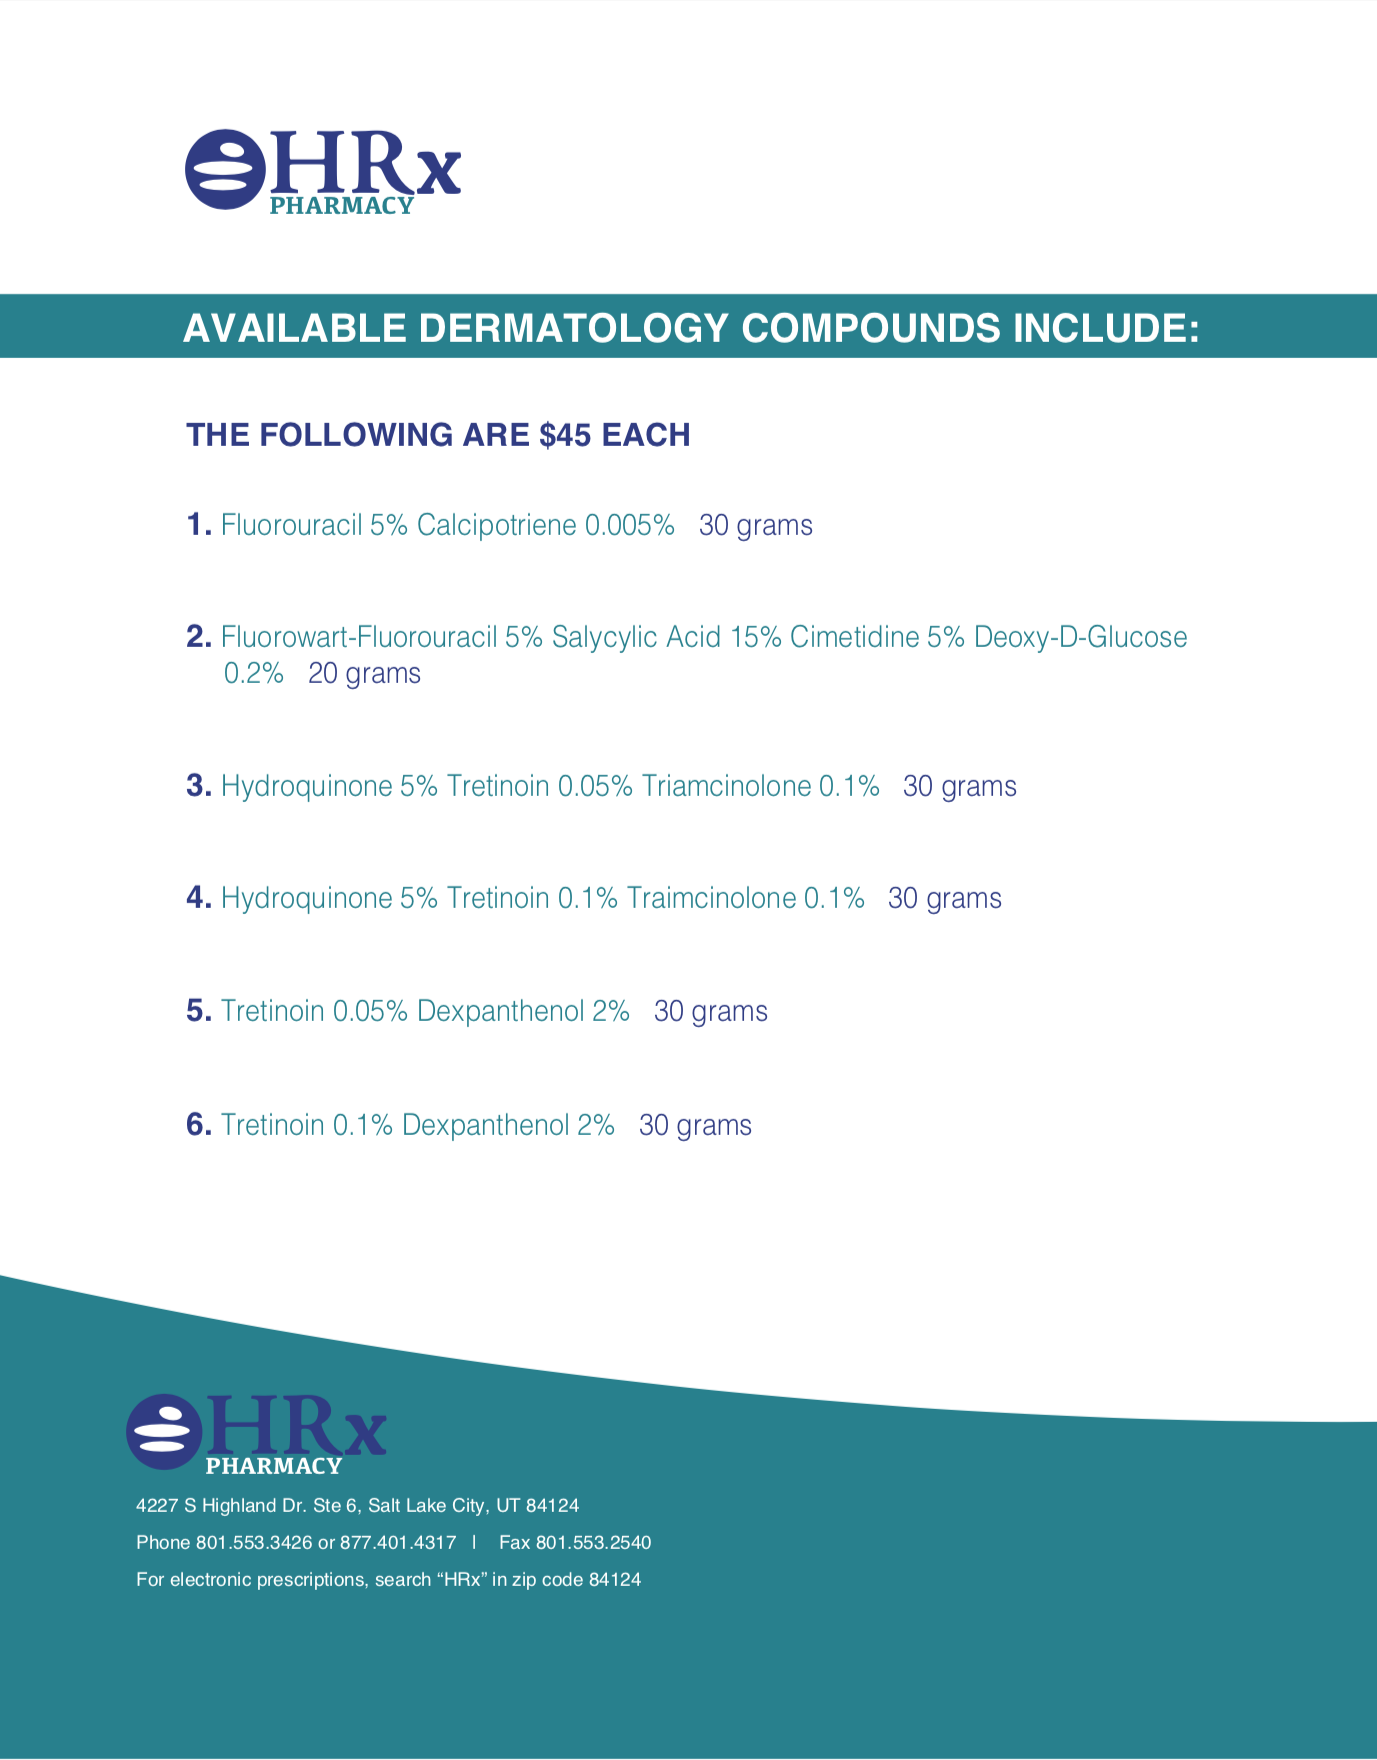 Available Dermatology Compounds.png